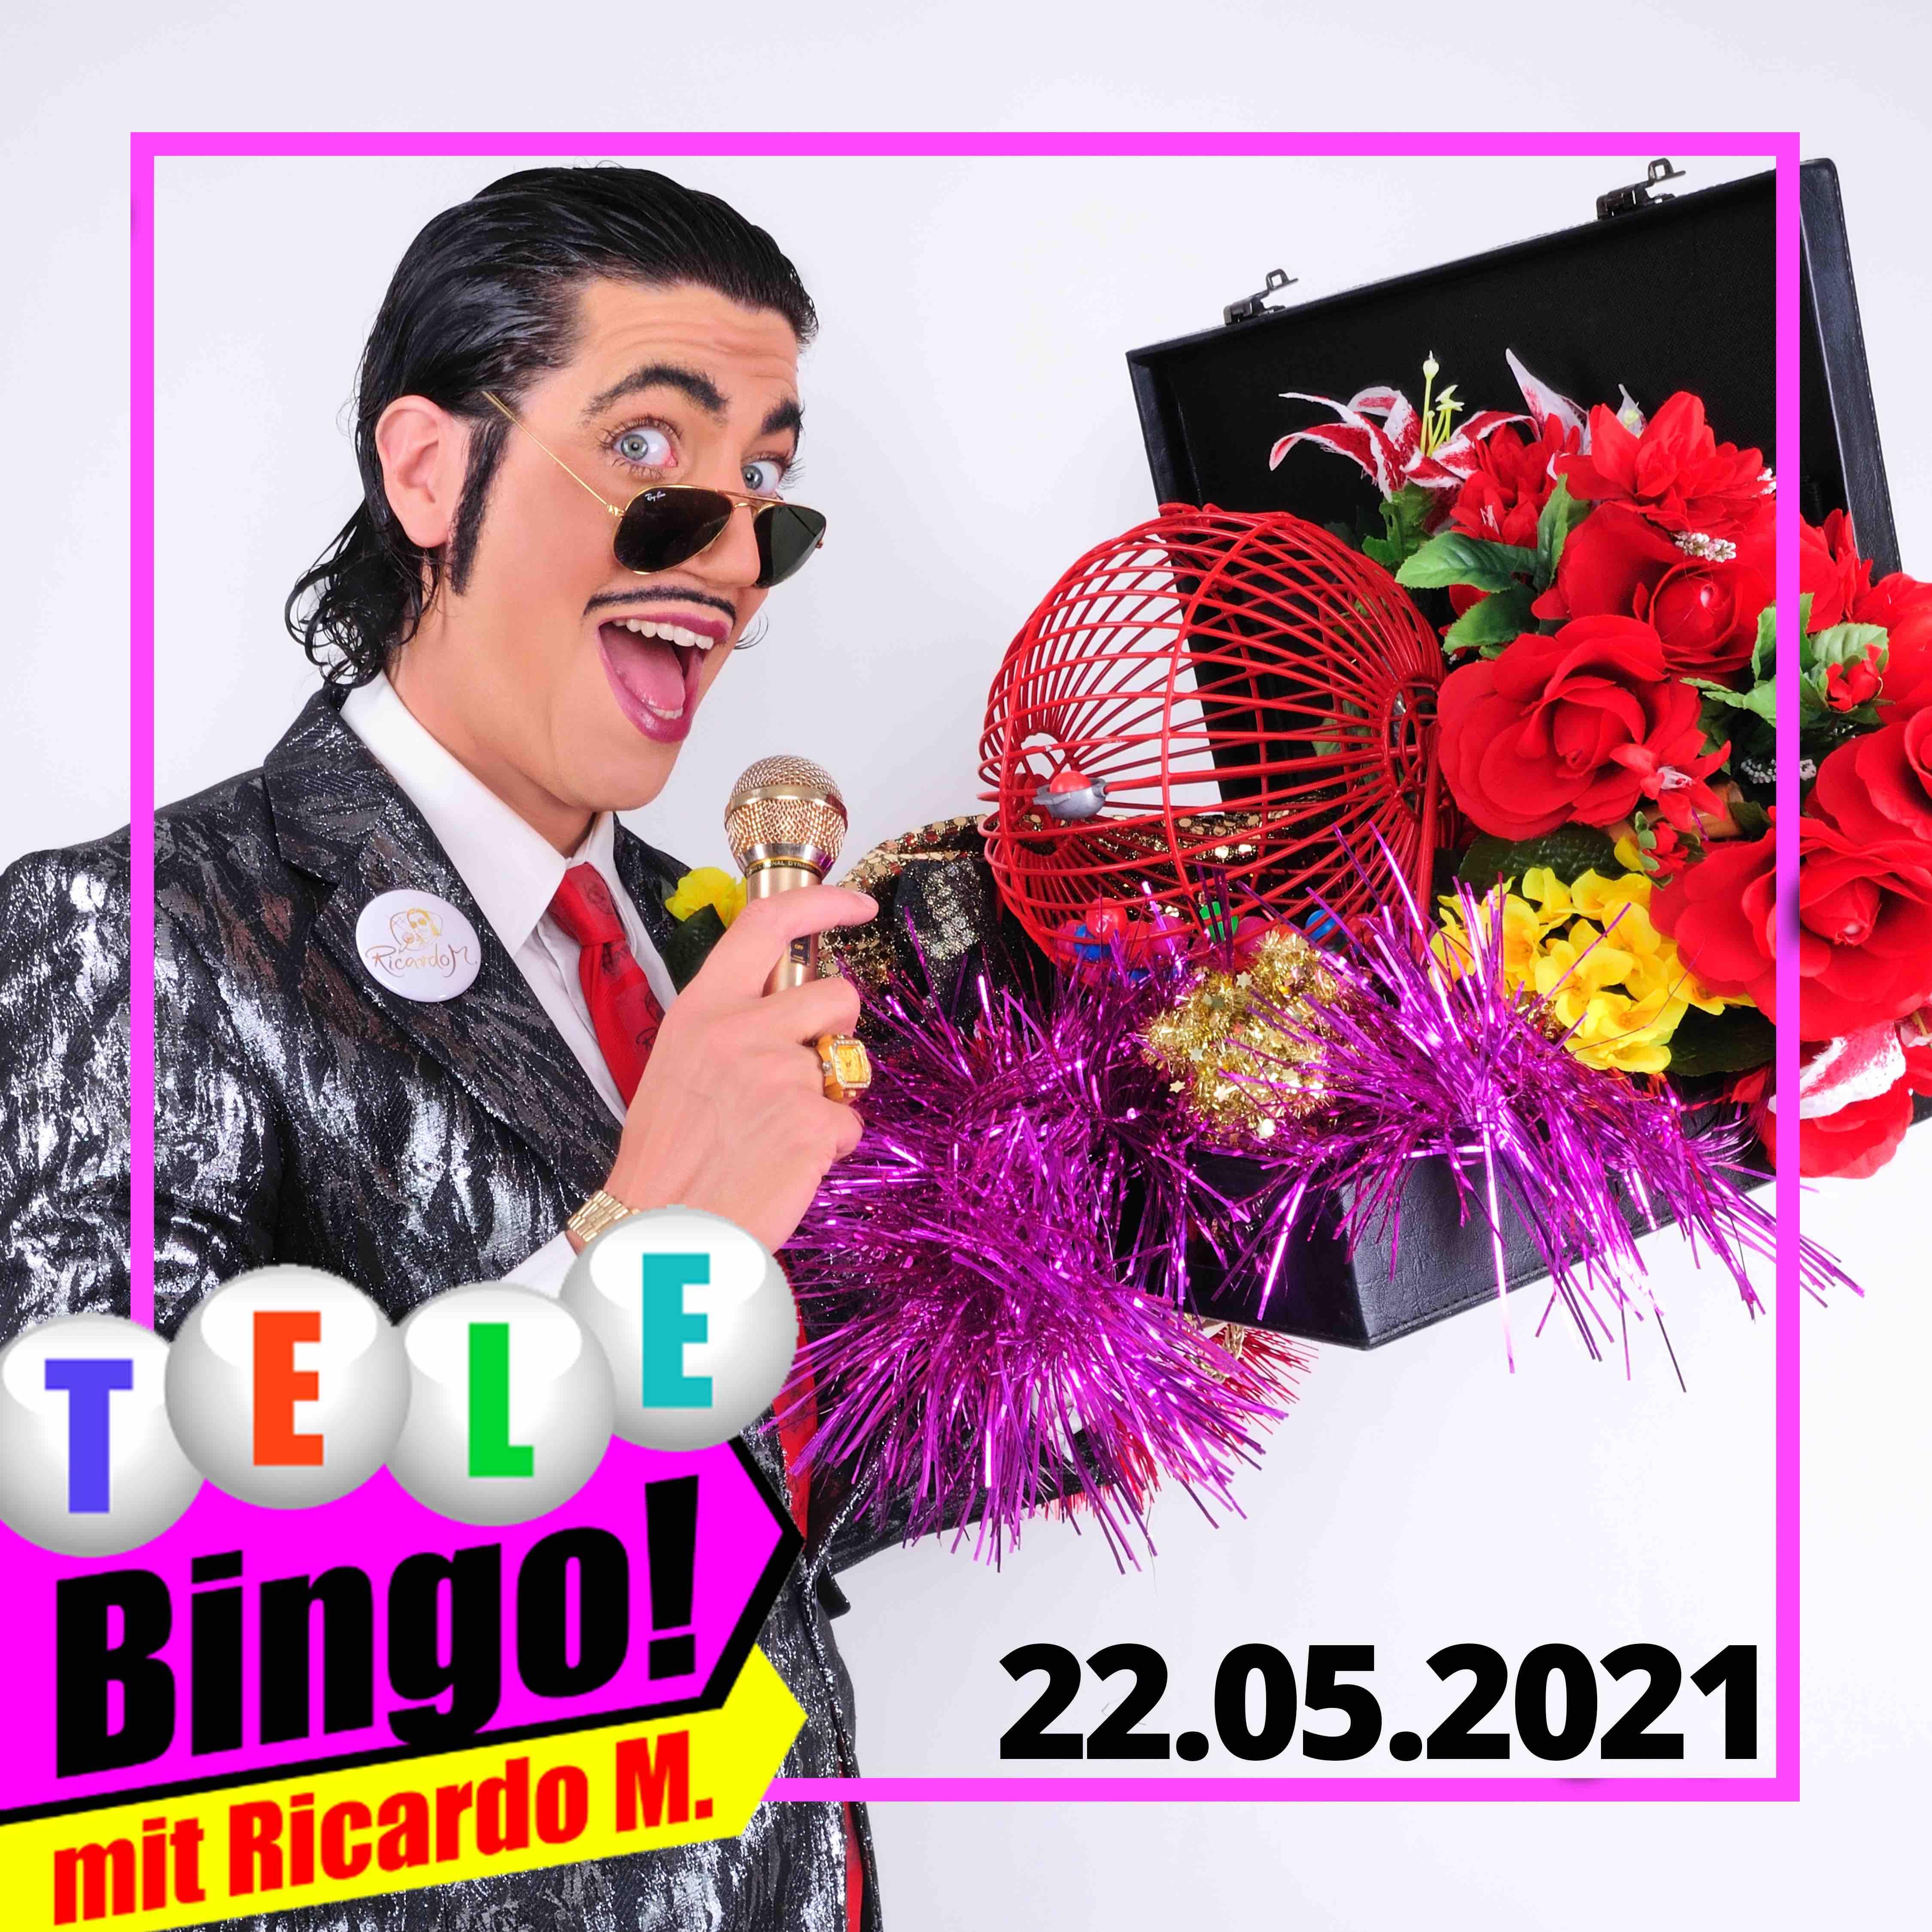 Premiere: Tele-Bingo! mit Ricardo M.